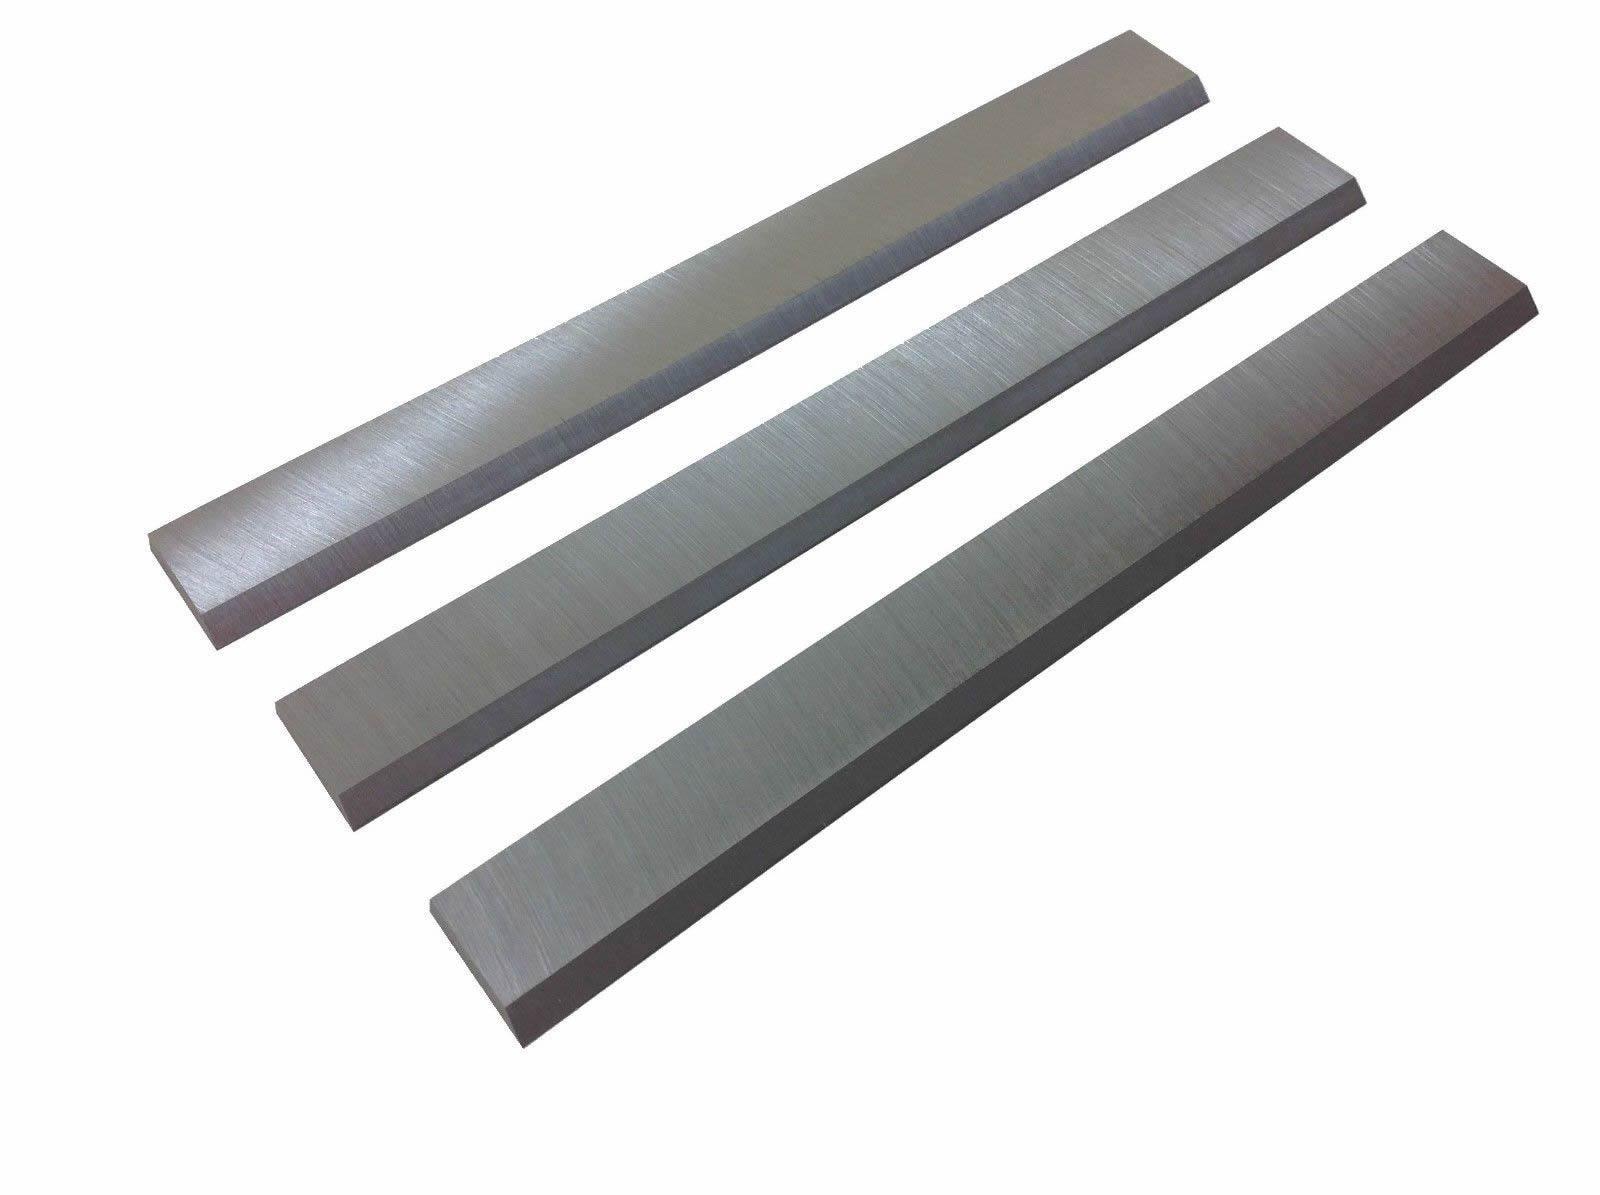 HZ 3PCS 6 155x16x3mm HSS Planer Knives Jointer Blade for Delta, JET, Powermatic, Craftsman, Rockwel , Ridgid jointers труборез ridgid 23488